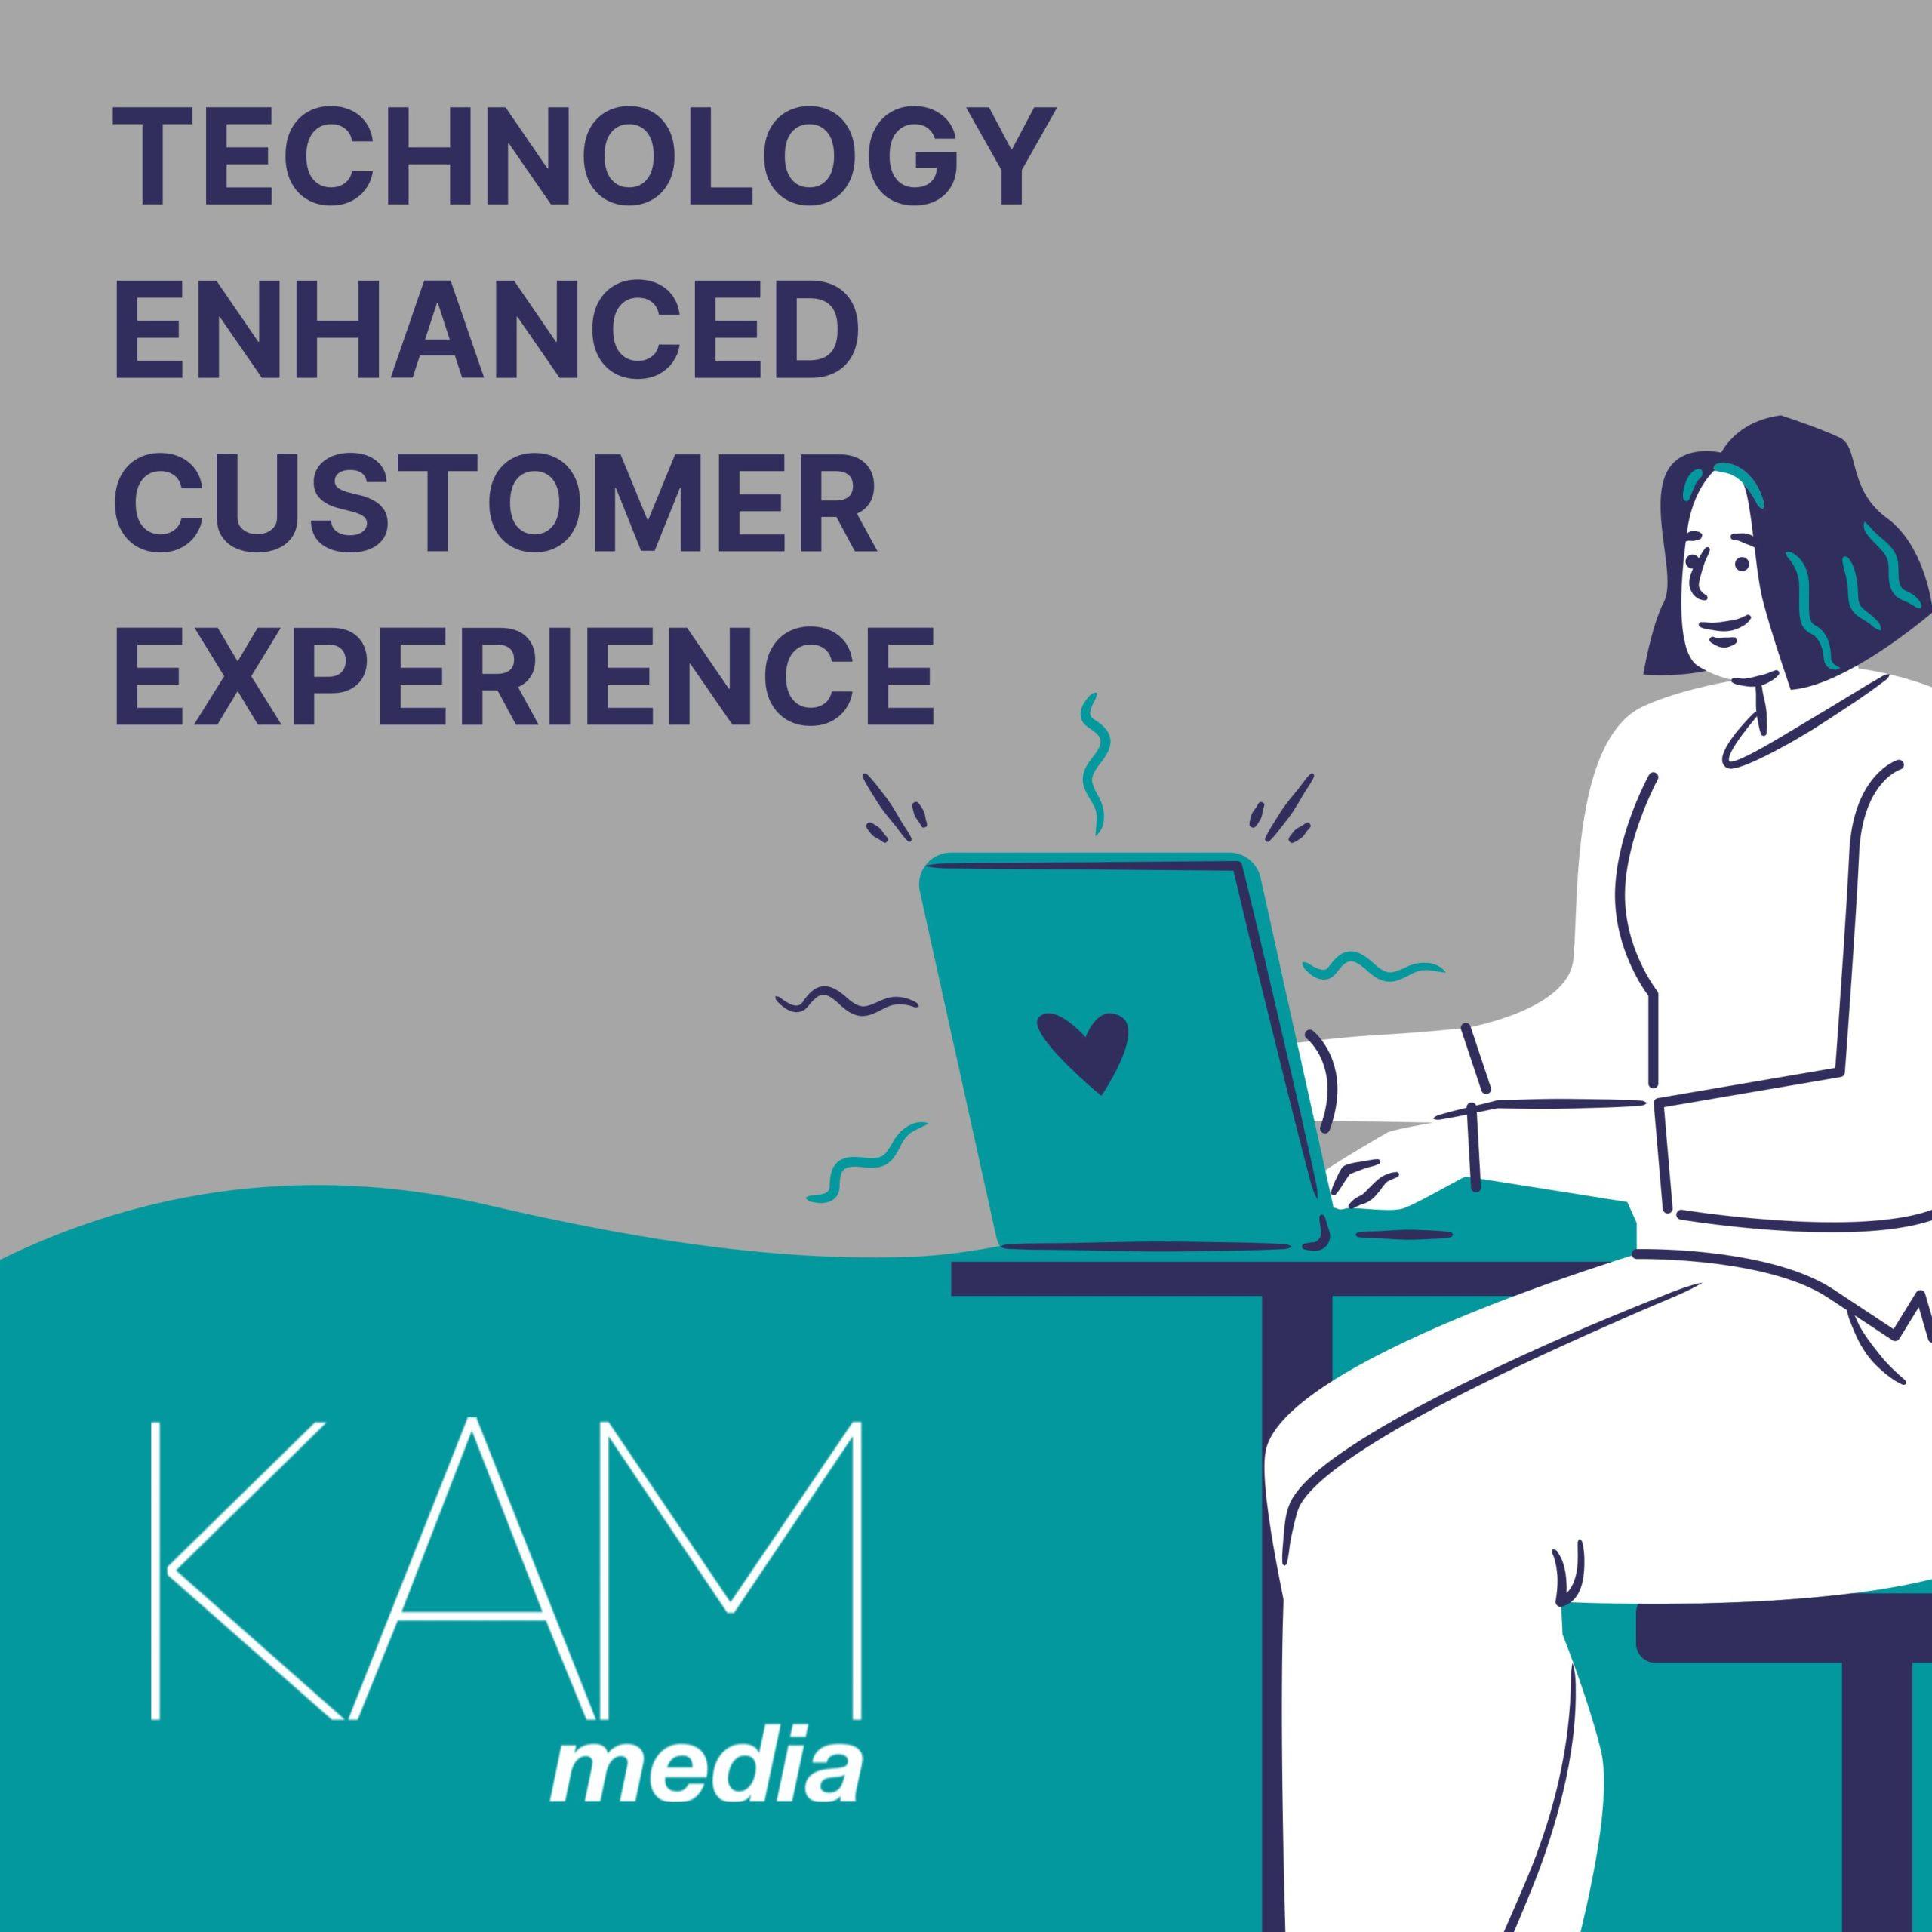 Technology enhanced customer experience